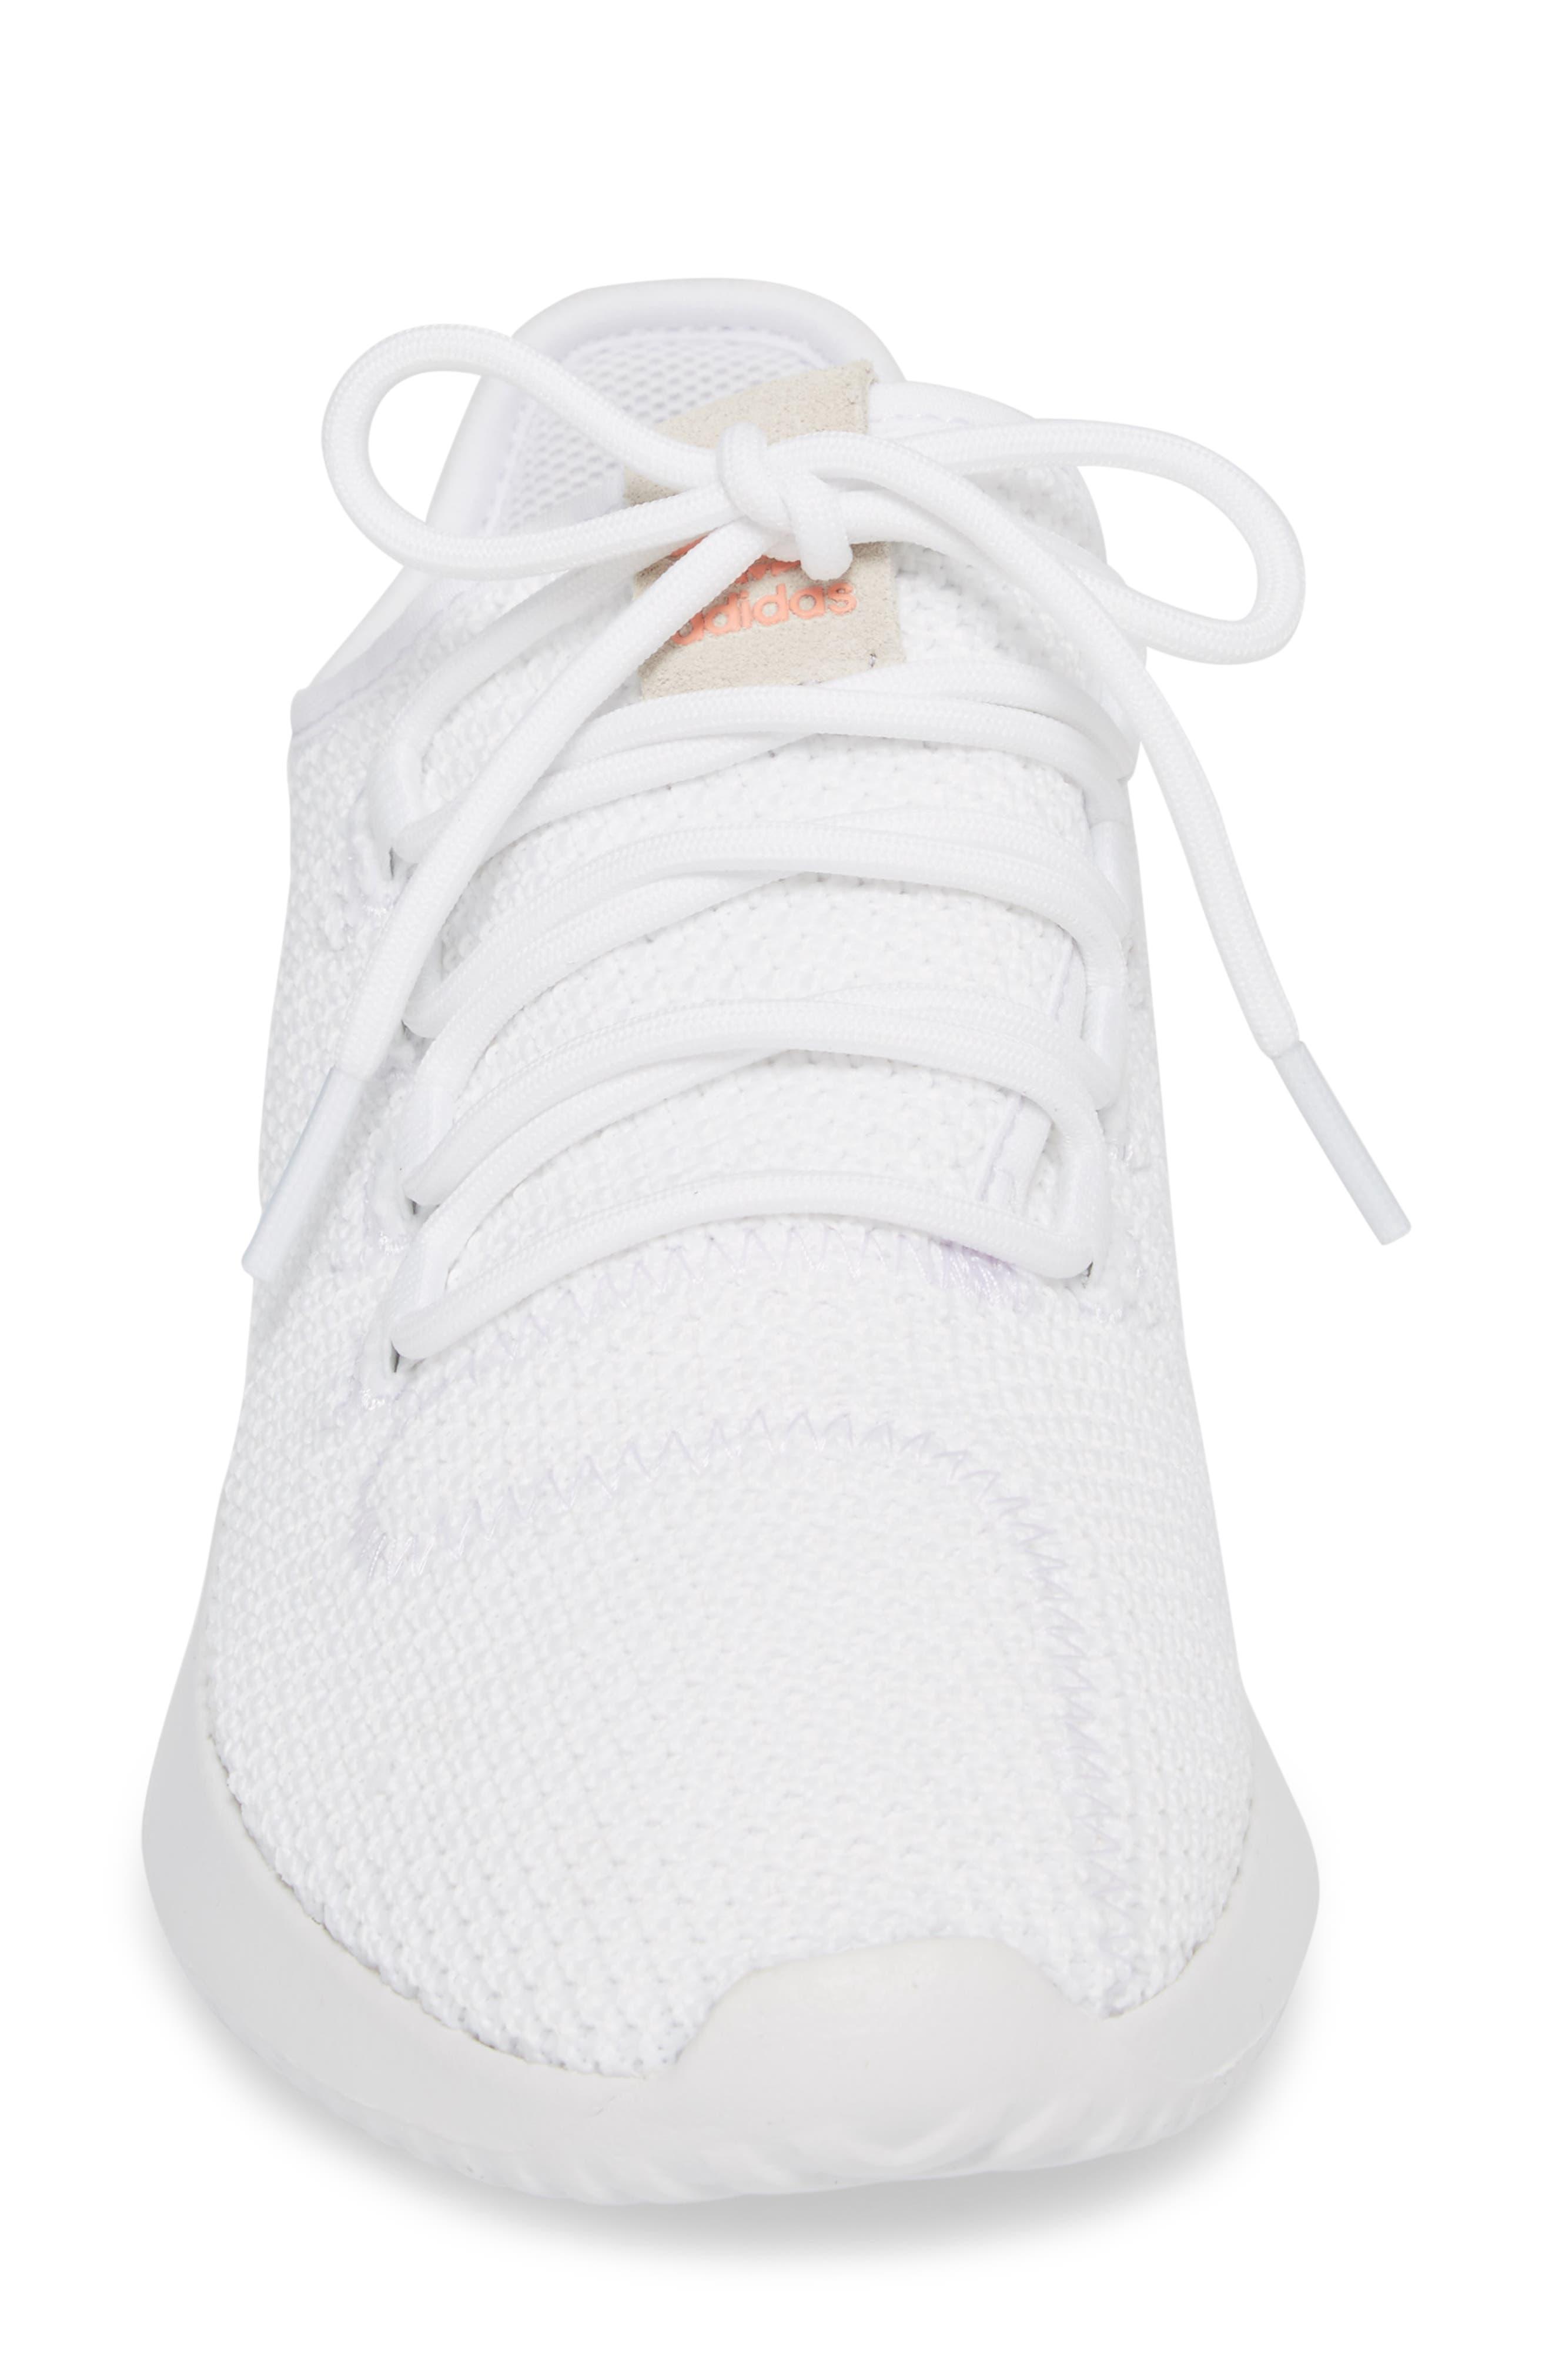 Tubular Shadow Sneaker,                             Alternate thumbnail 5, color,                             White/ White/ Core Black